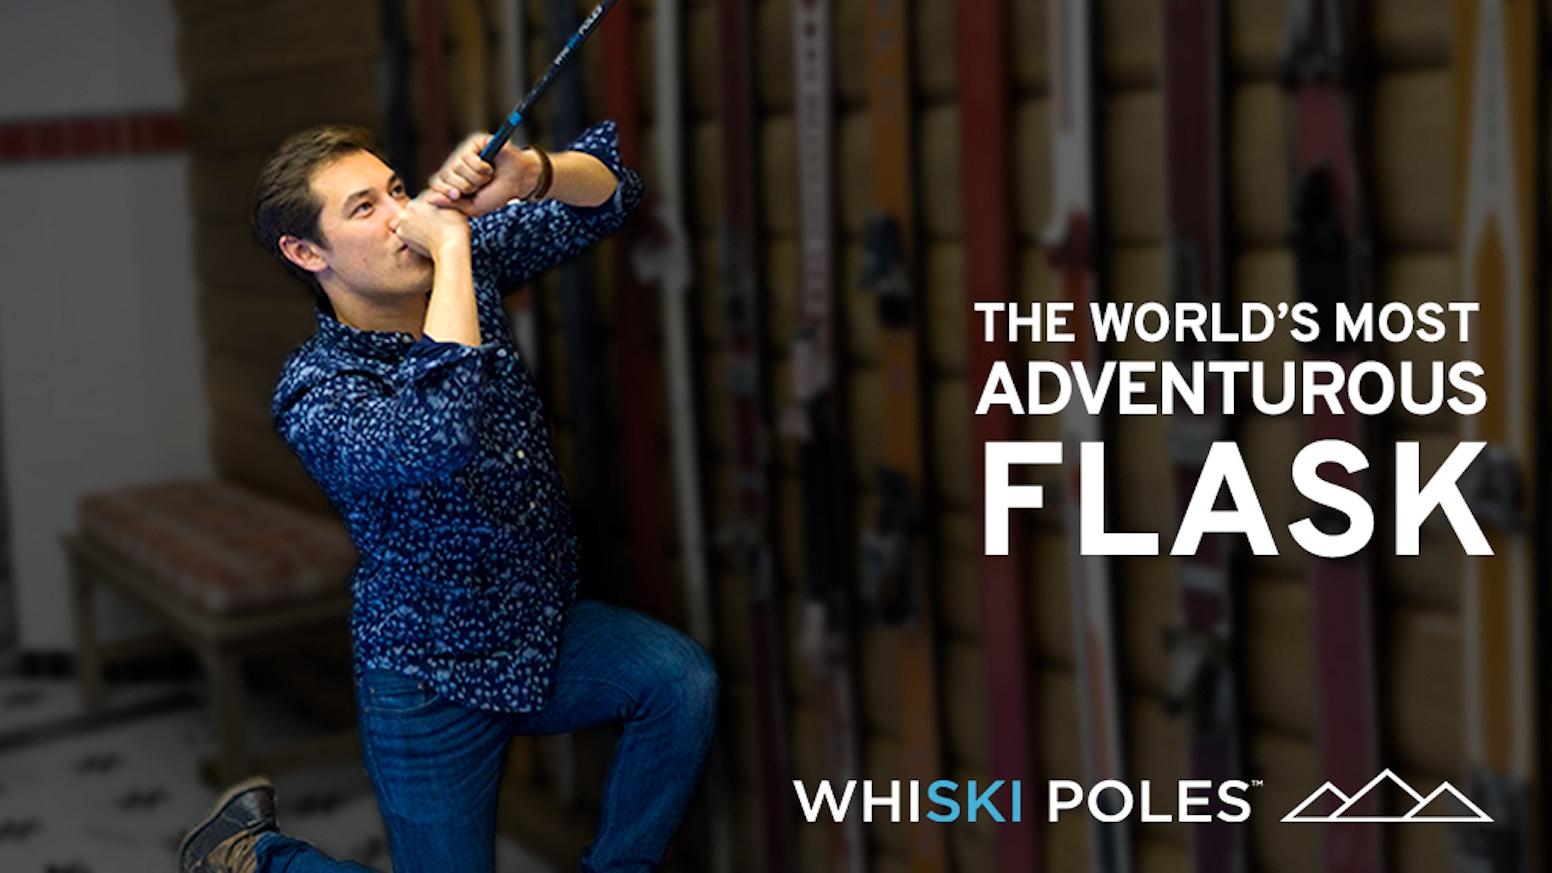 WhiSki Poles = Ski Pole Flasks...High-performance ski poles with an integrated flask.  Enjoy a drink post-ski, or simply skip the slopes and embrace the après ski life!